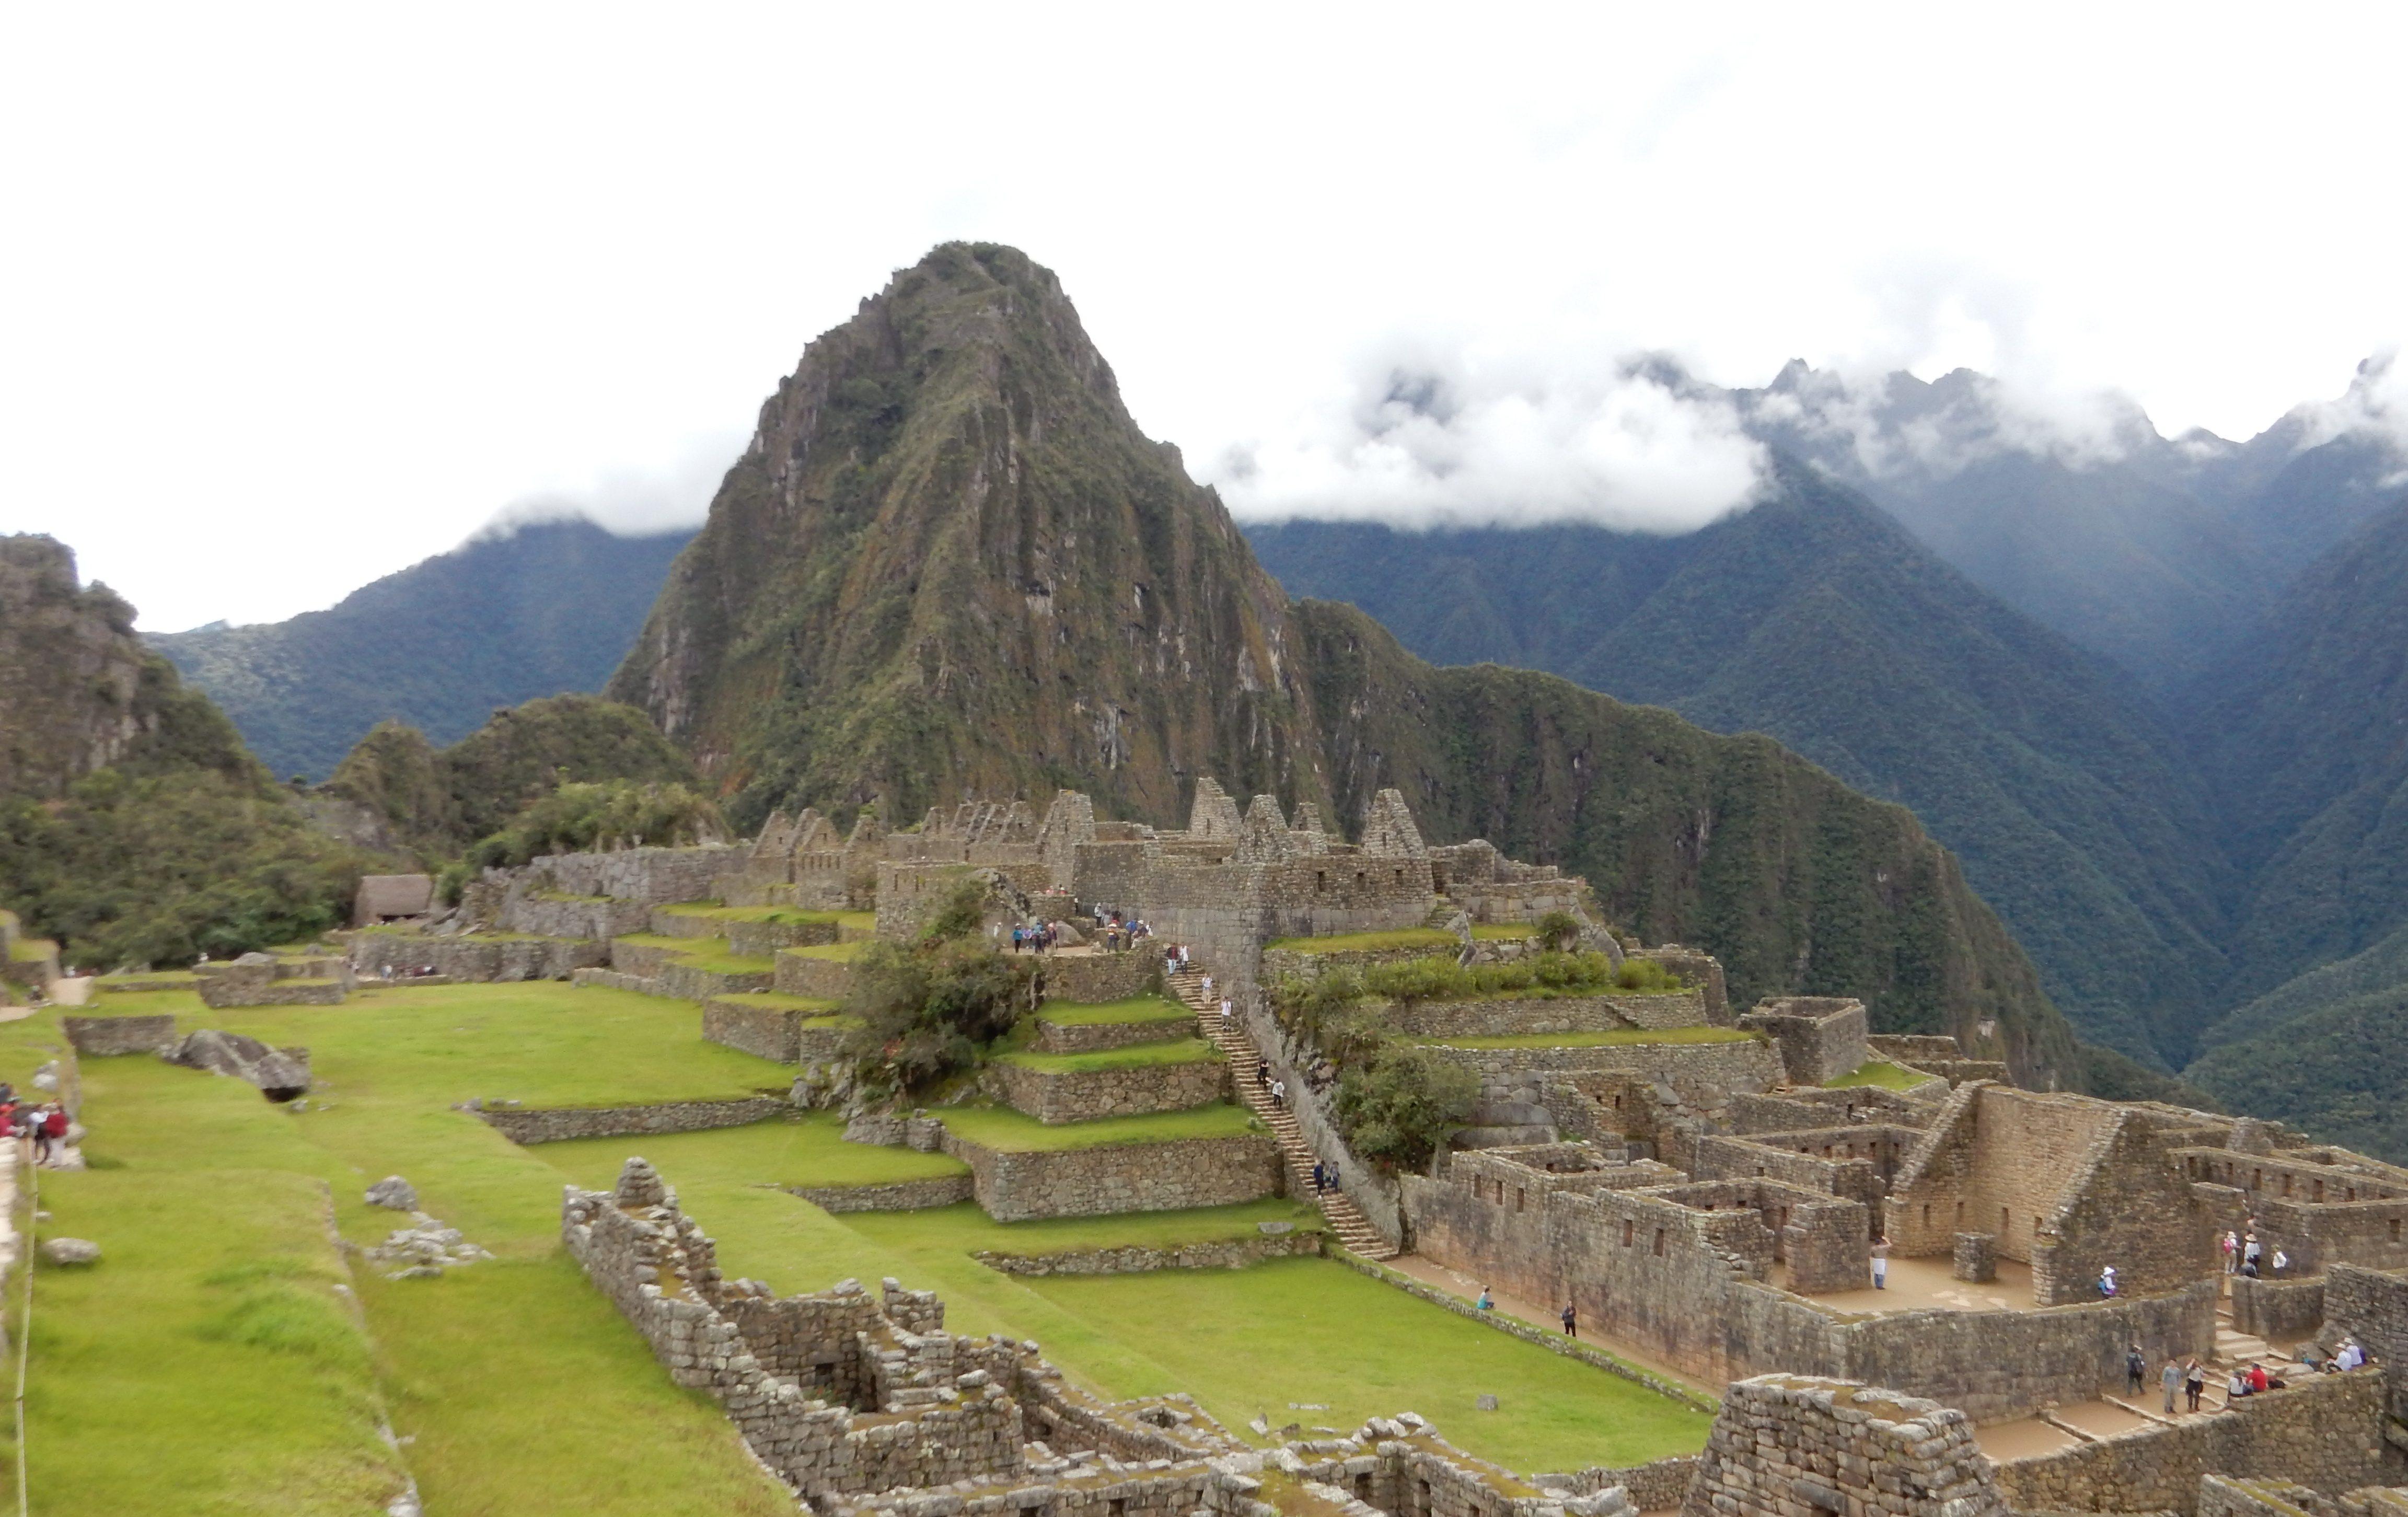 How to Plan a One Day Machu Picchu Trip